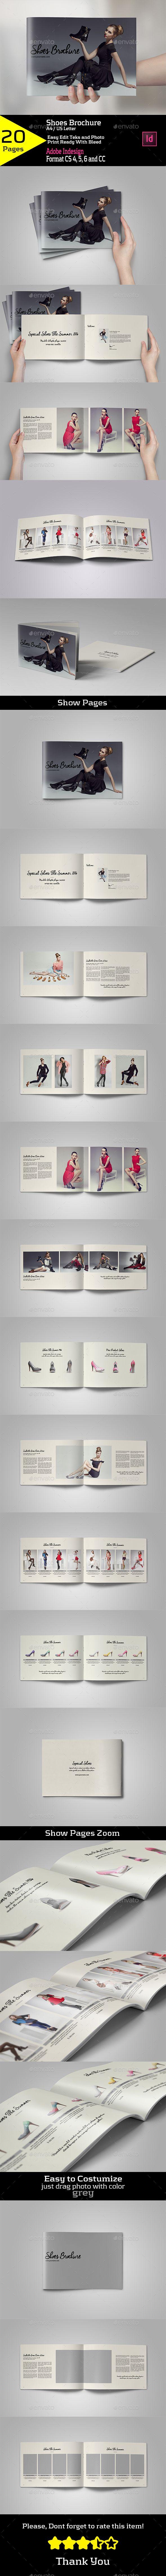 Shoes Brochure A4/US Letter Template PSD #design Download: http://graphicriver.net/item/shoes-brochure-a4us-letter/13495650?ref=ksioks